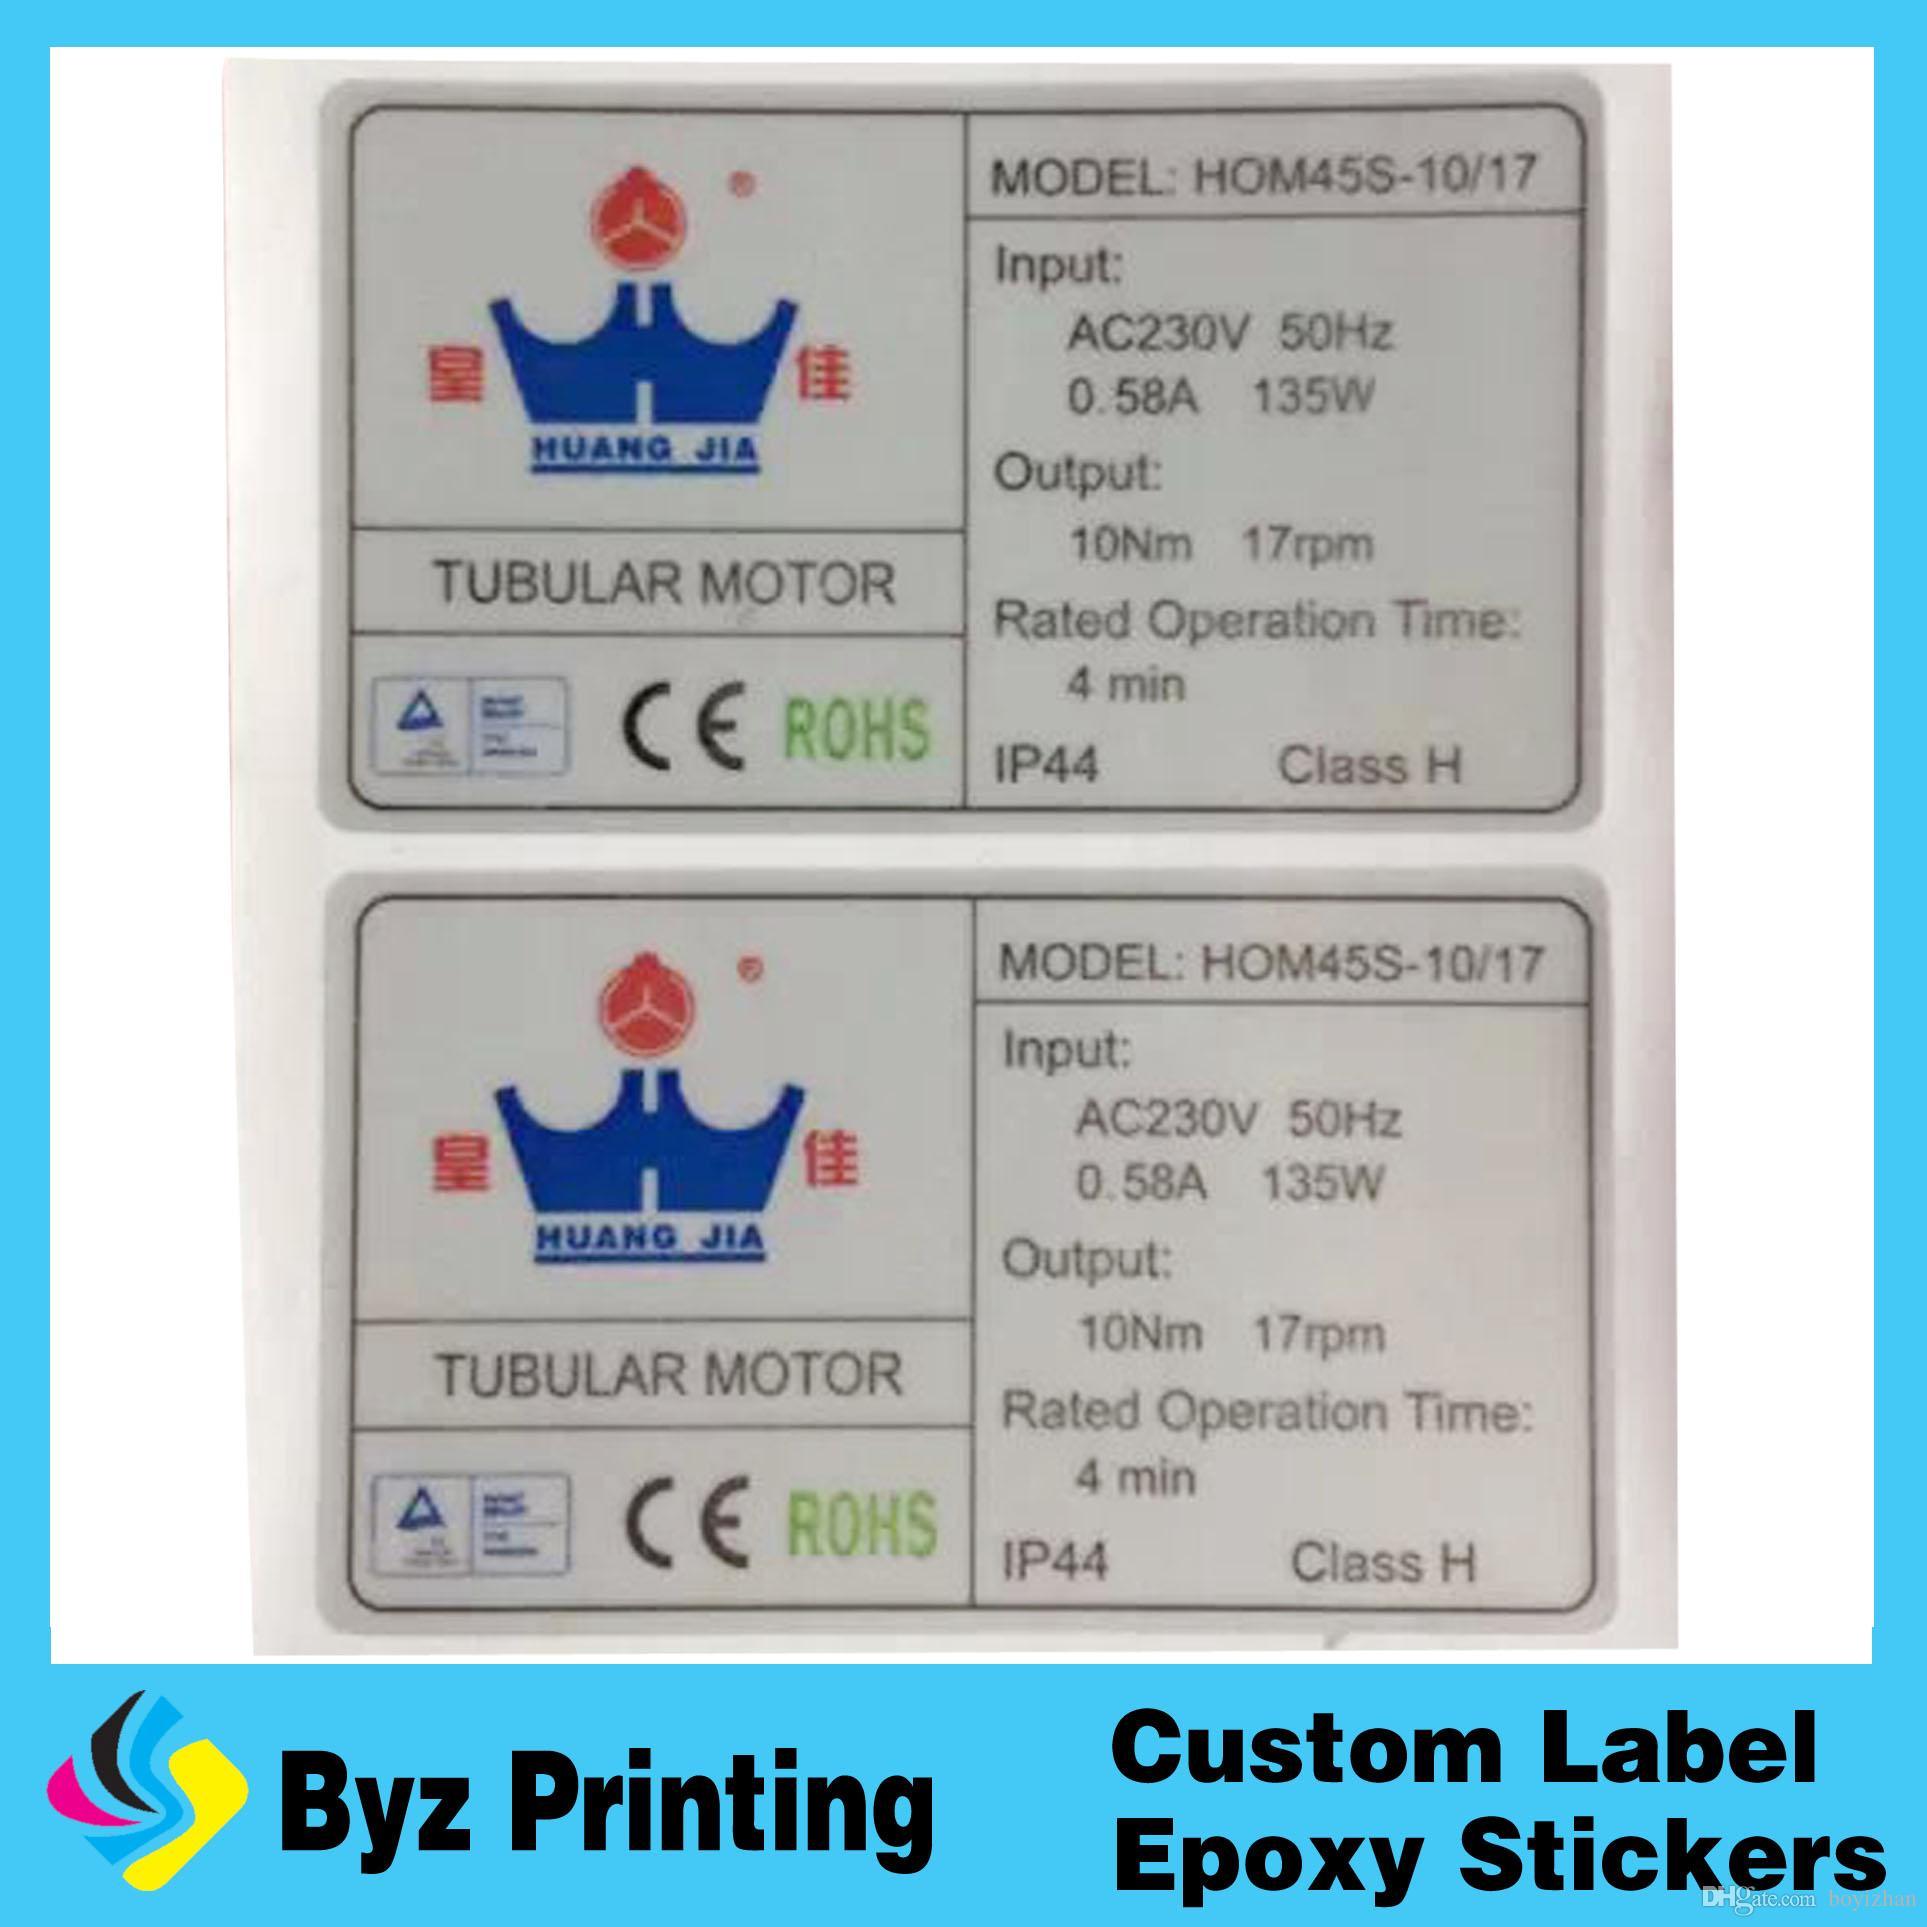 Die Cut Viny Custom Stickers Custom Vinyl Decal Full Color Color - Order stickers online cheap